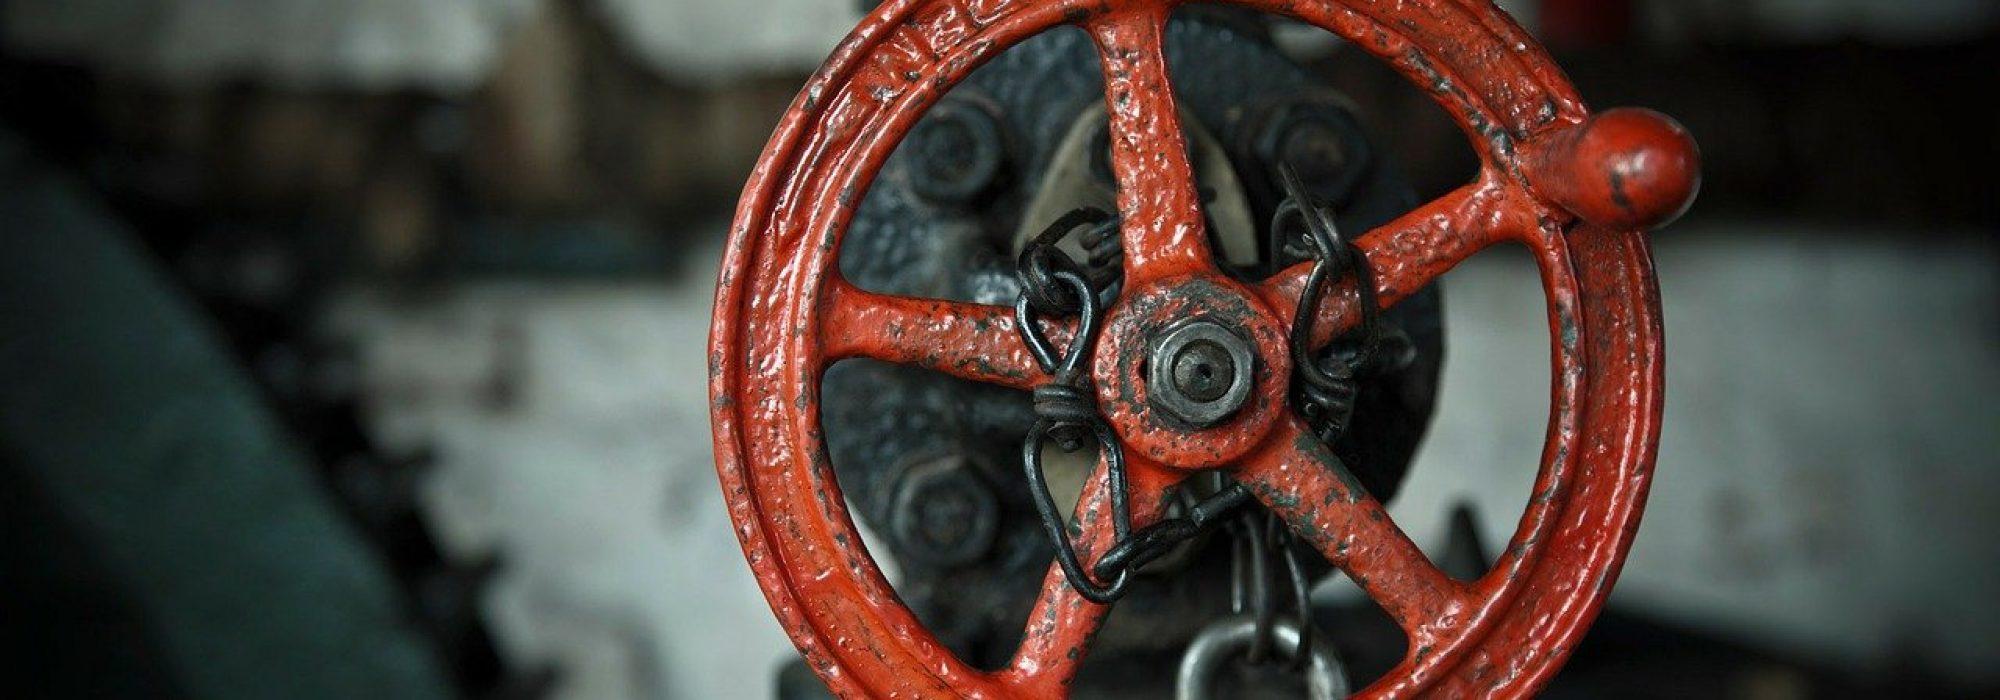 valve-164969_1280